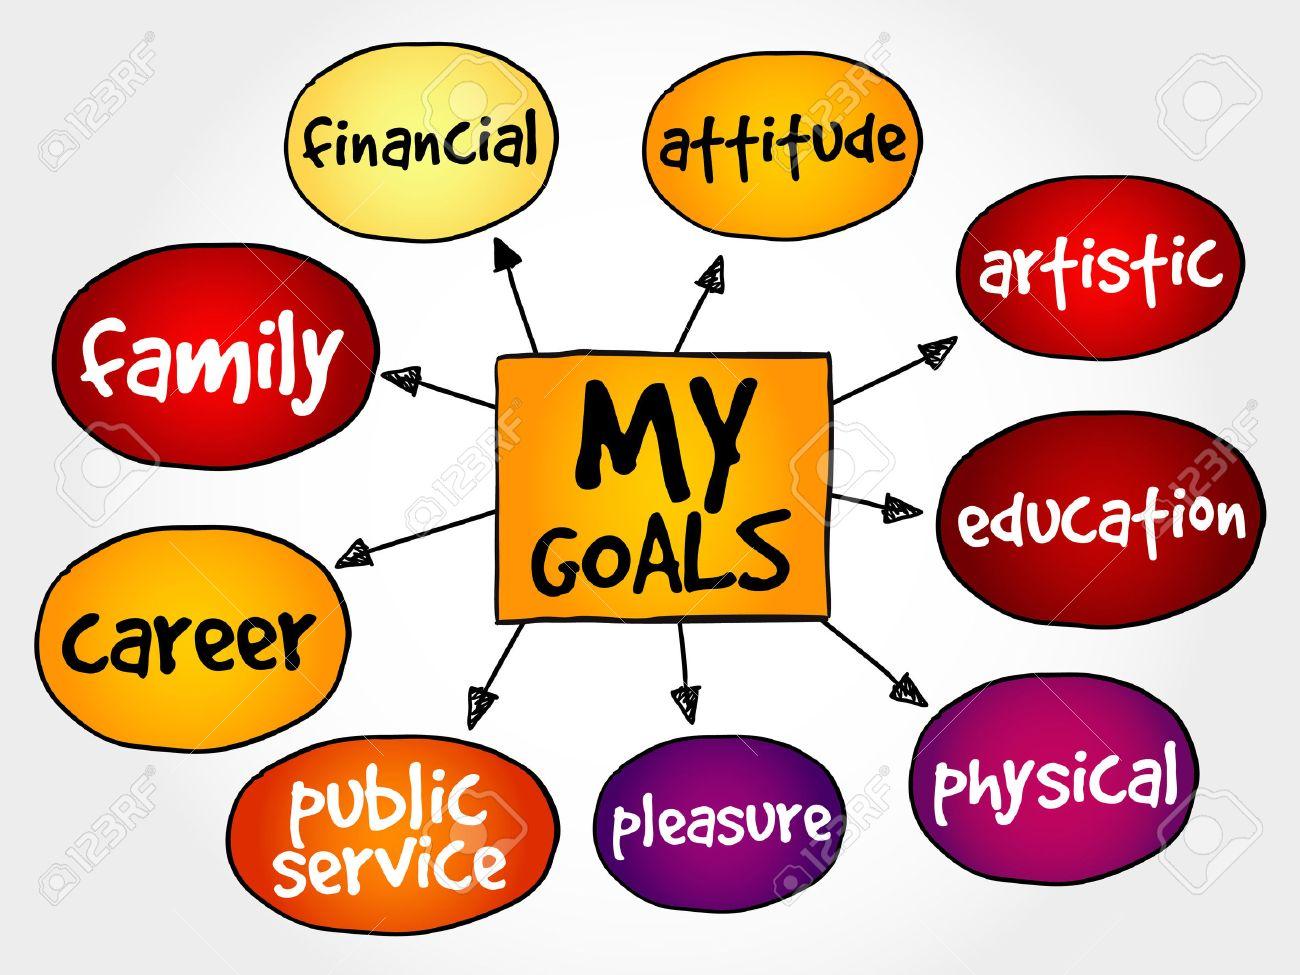 My Goals mind map business concept - 47322206